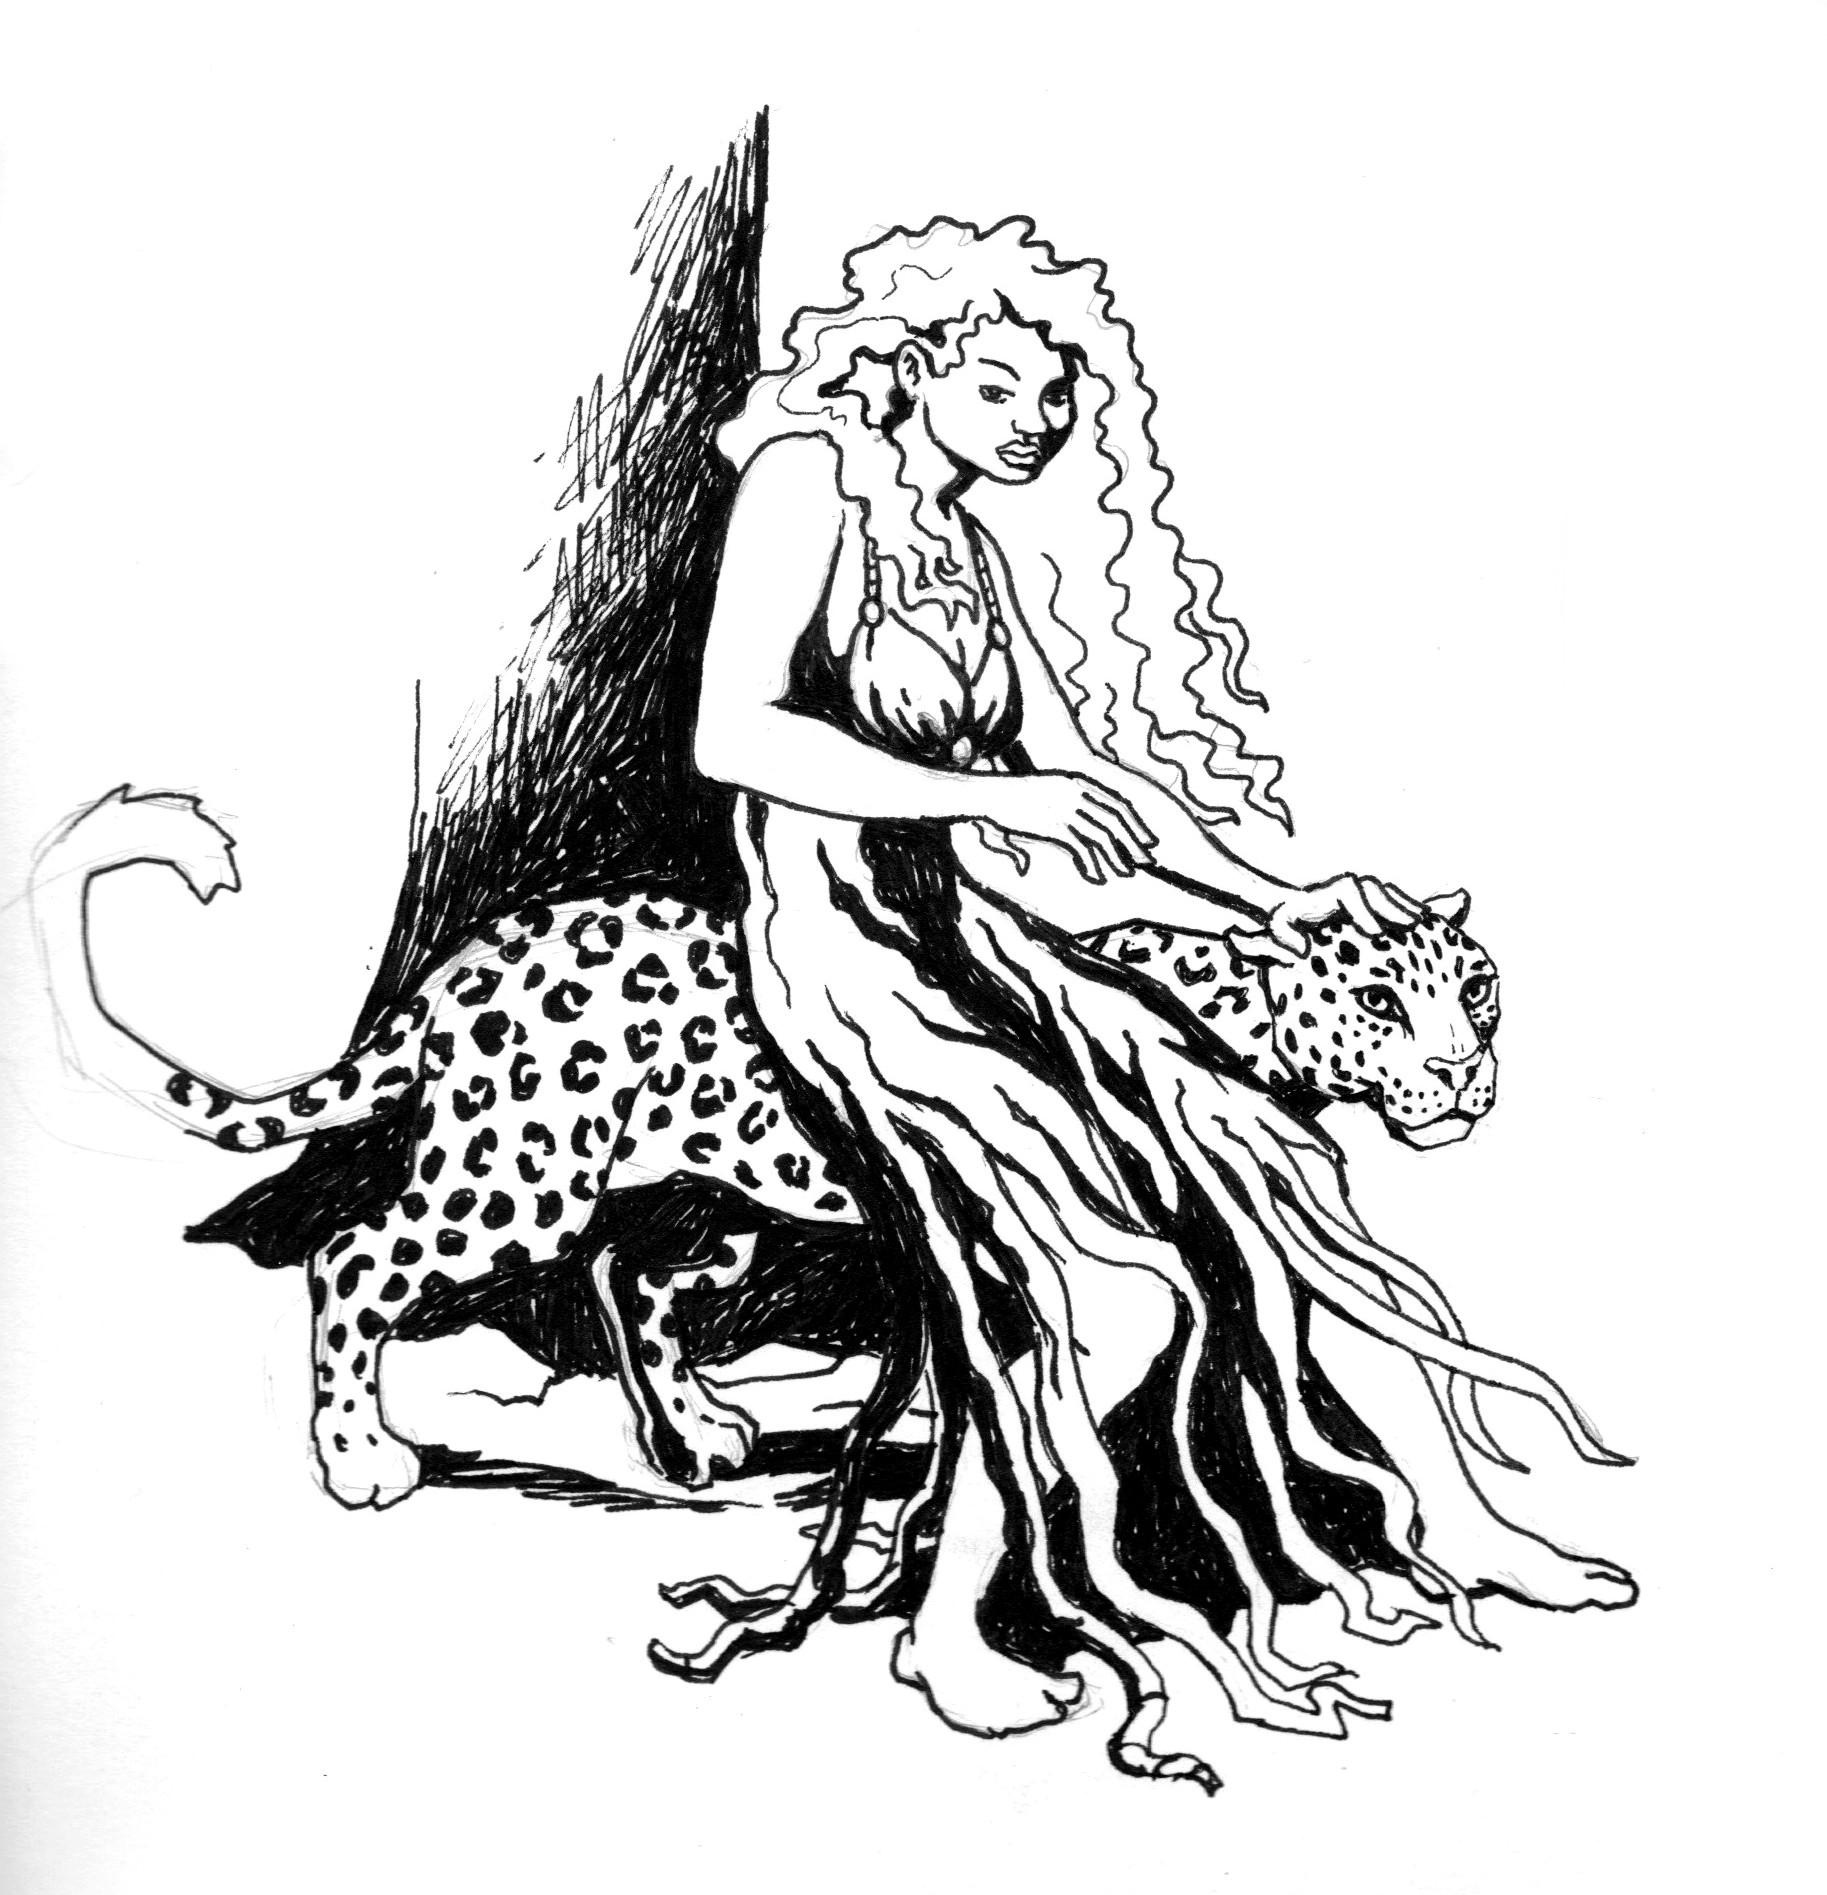 Patrick weck fantomah sketch 8